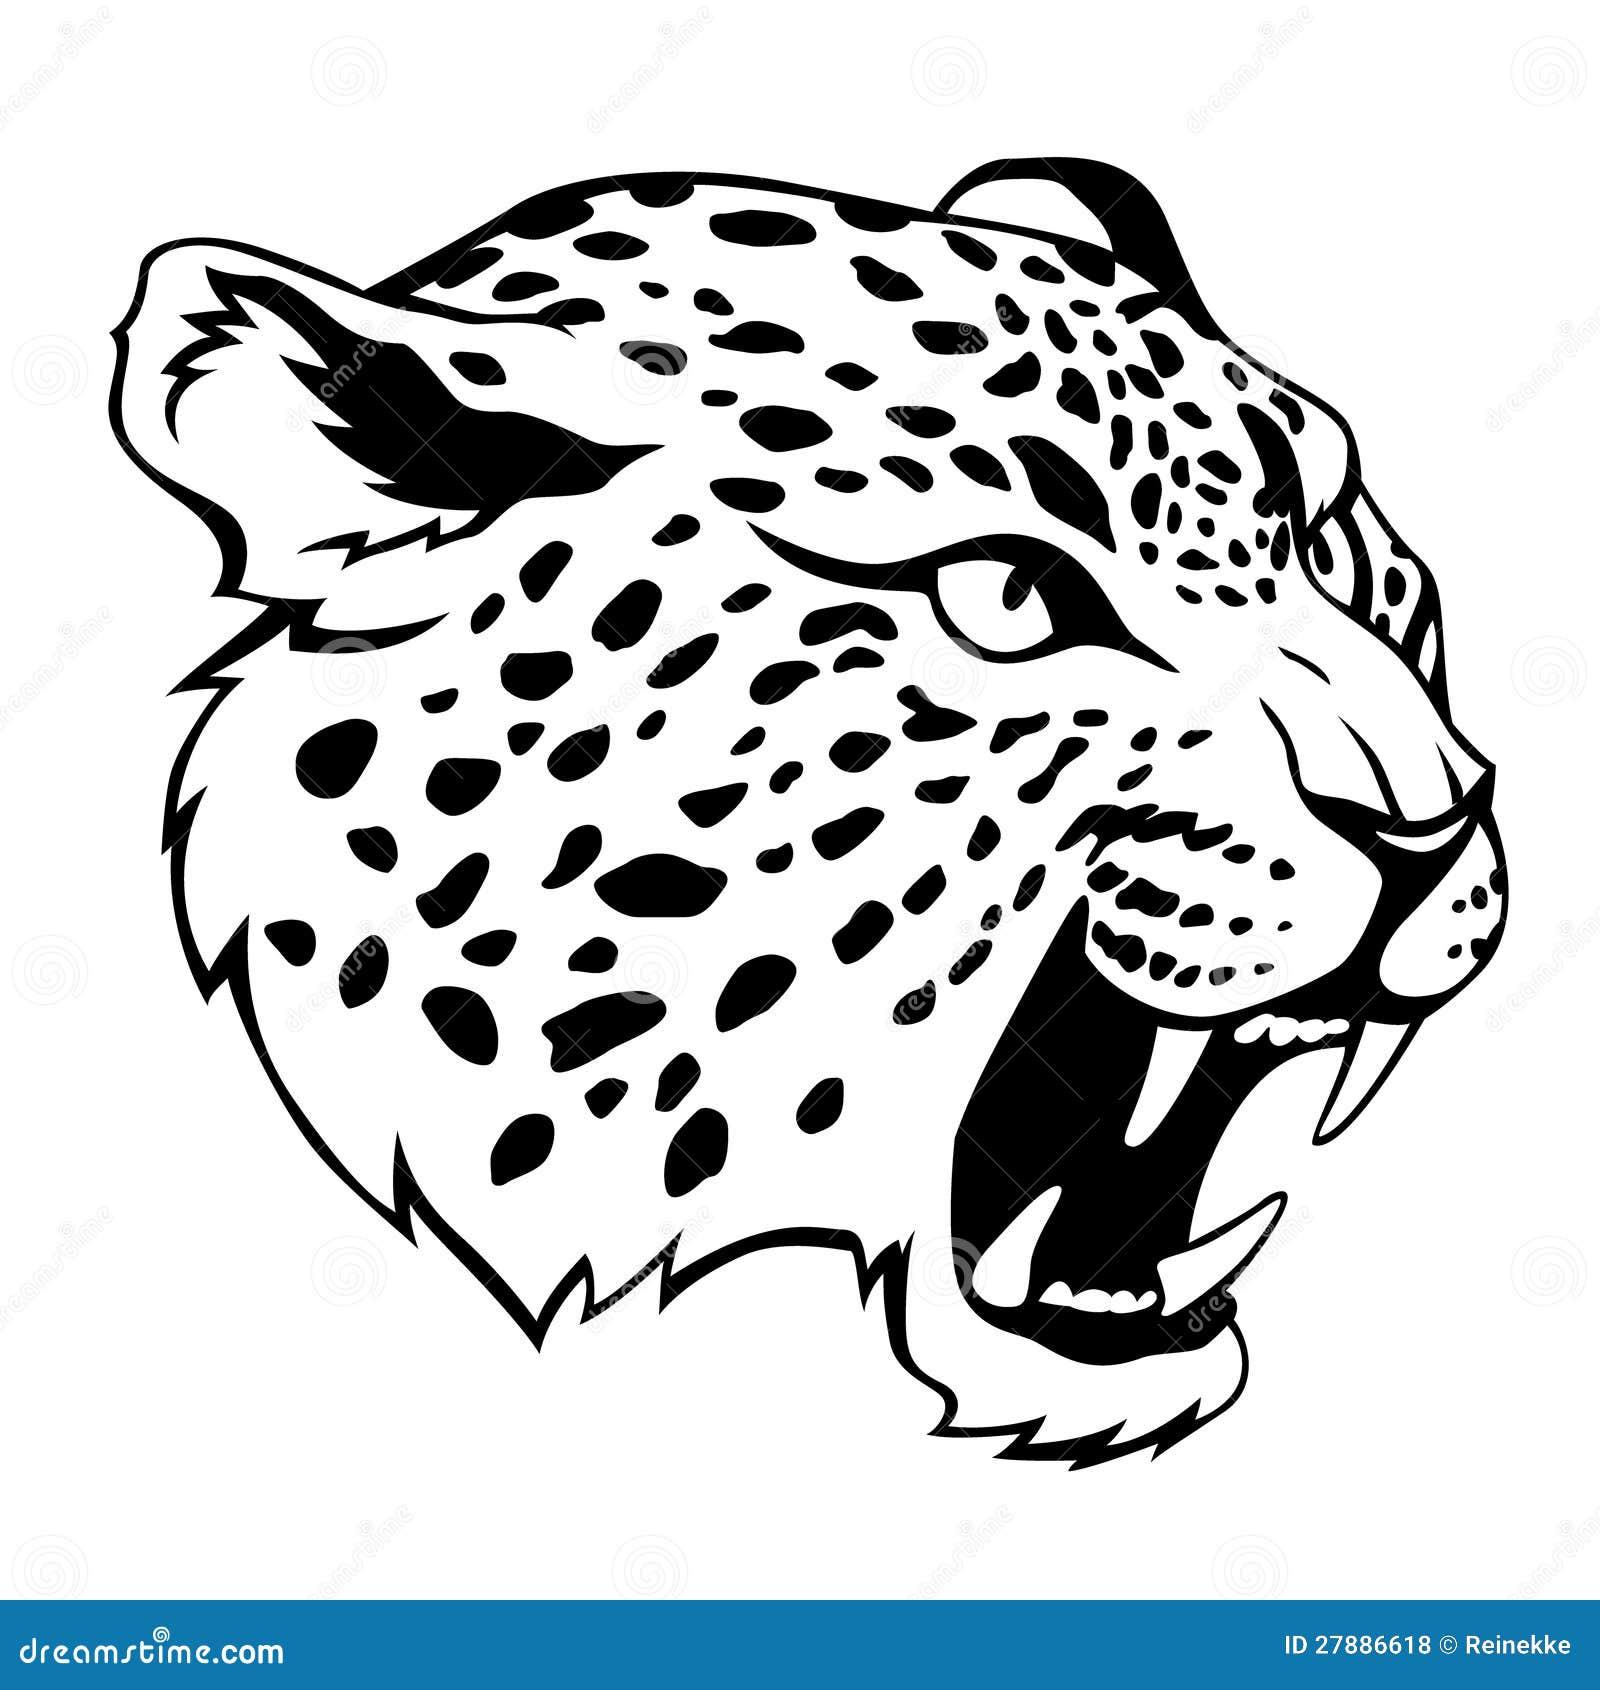 Black And White Odd Art : Tête de jaguar illustration vecteur du